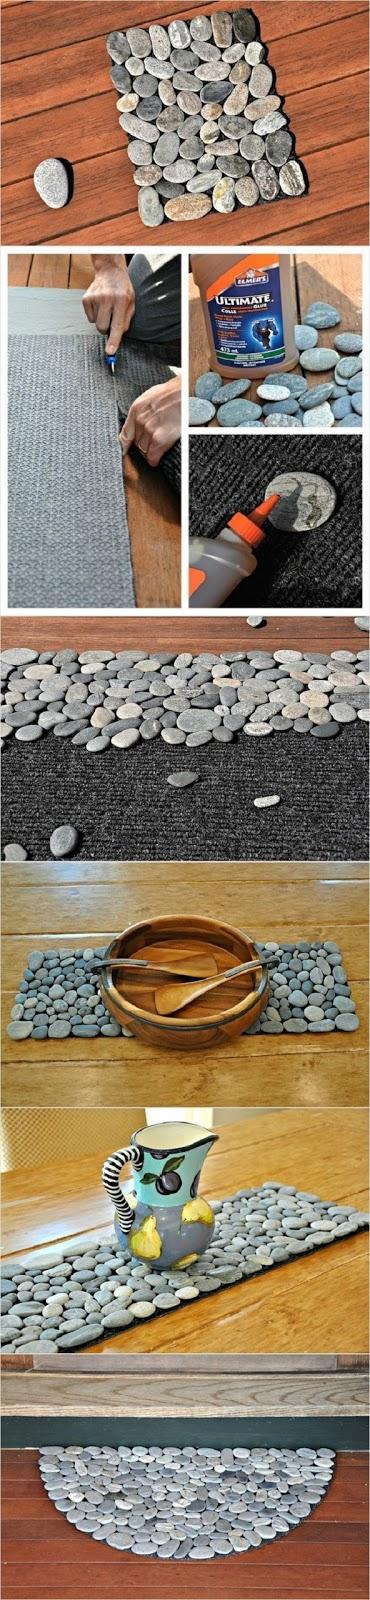 How to: Make a DIY Pebble Bath Mat | Rock, Craft and Crafty